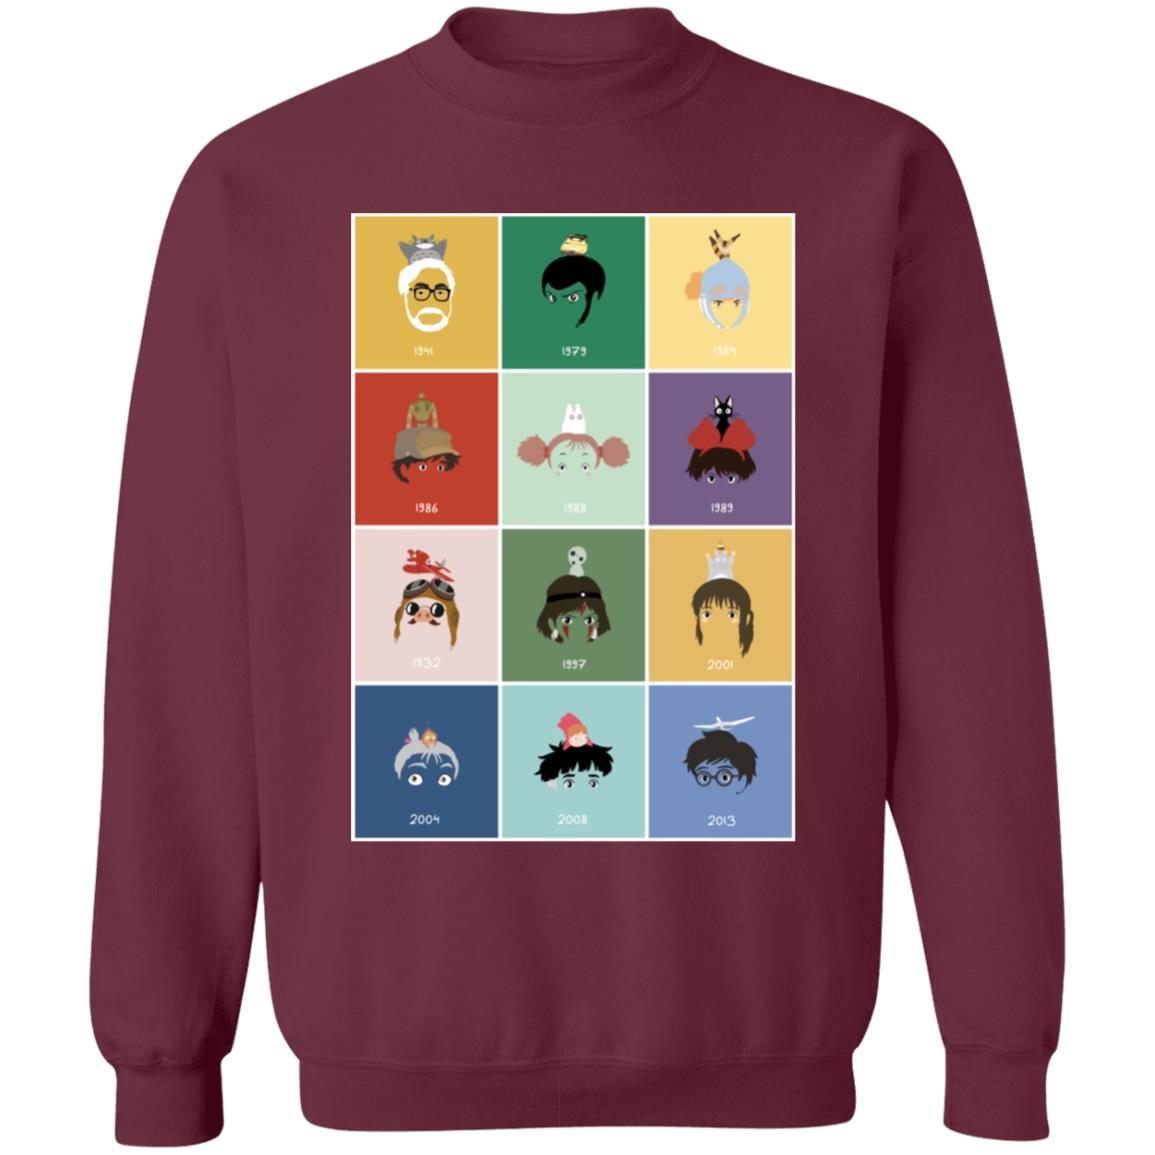 Ghibli Movie Collection Sweatshirt